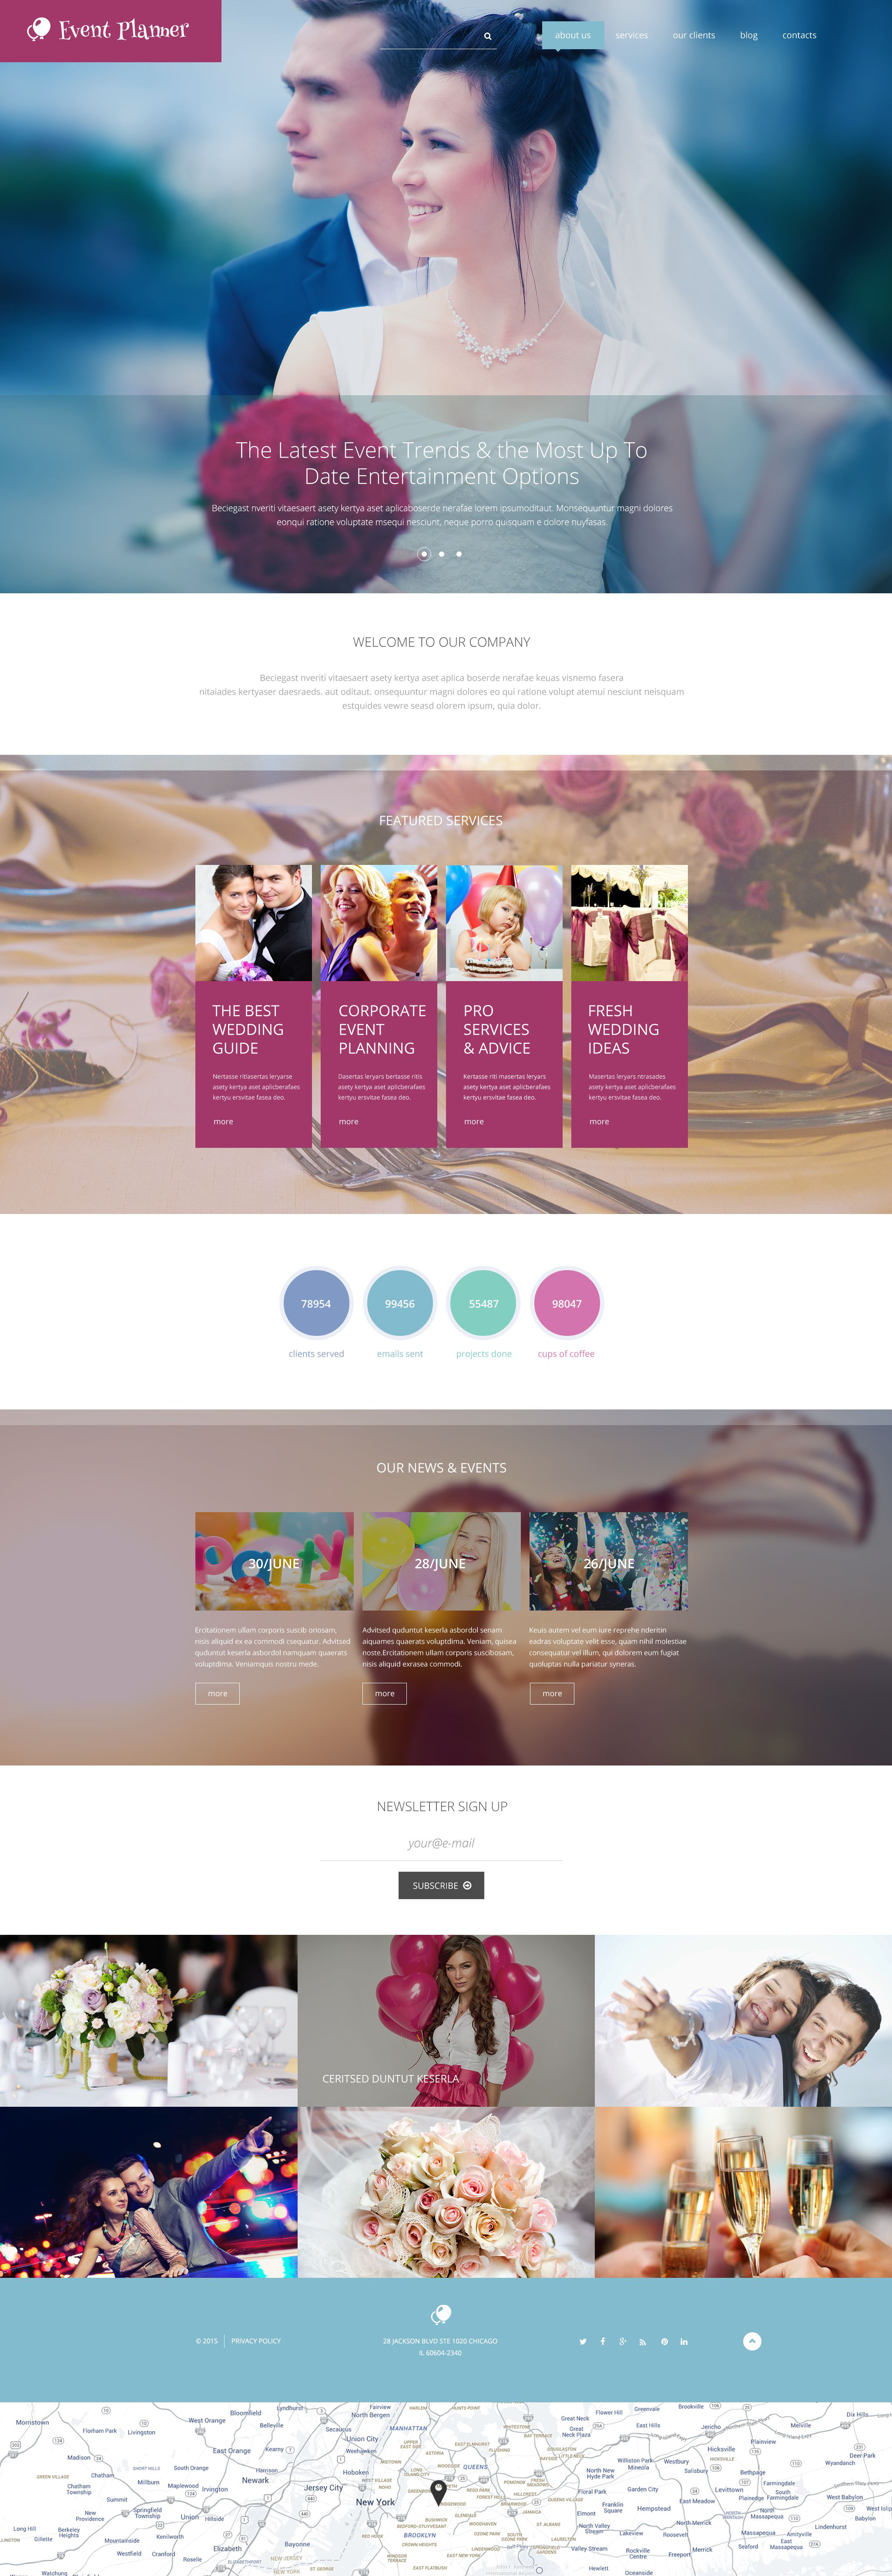 Responsywny szablon Drupal Event Planner #55160 - zrzut ekranu